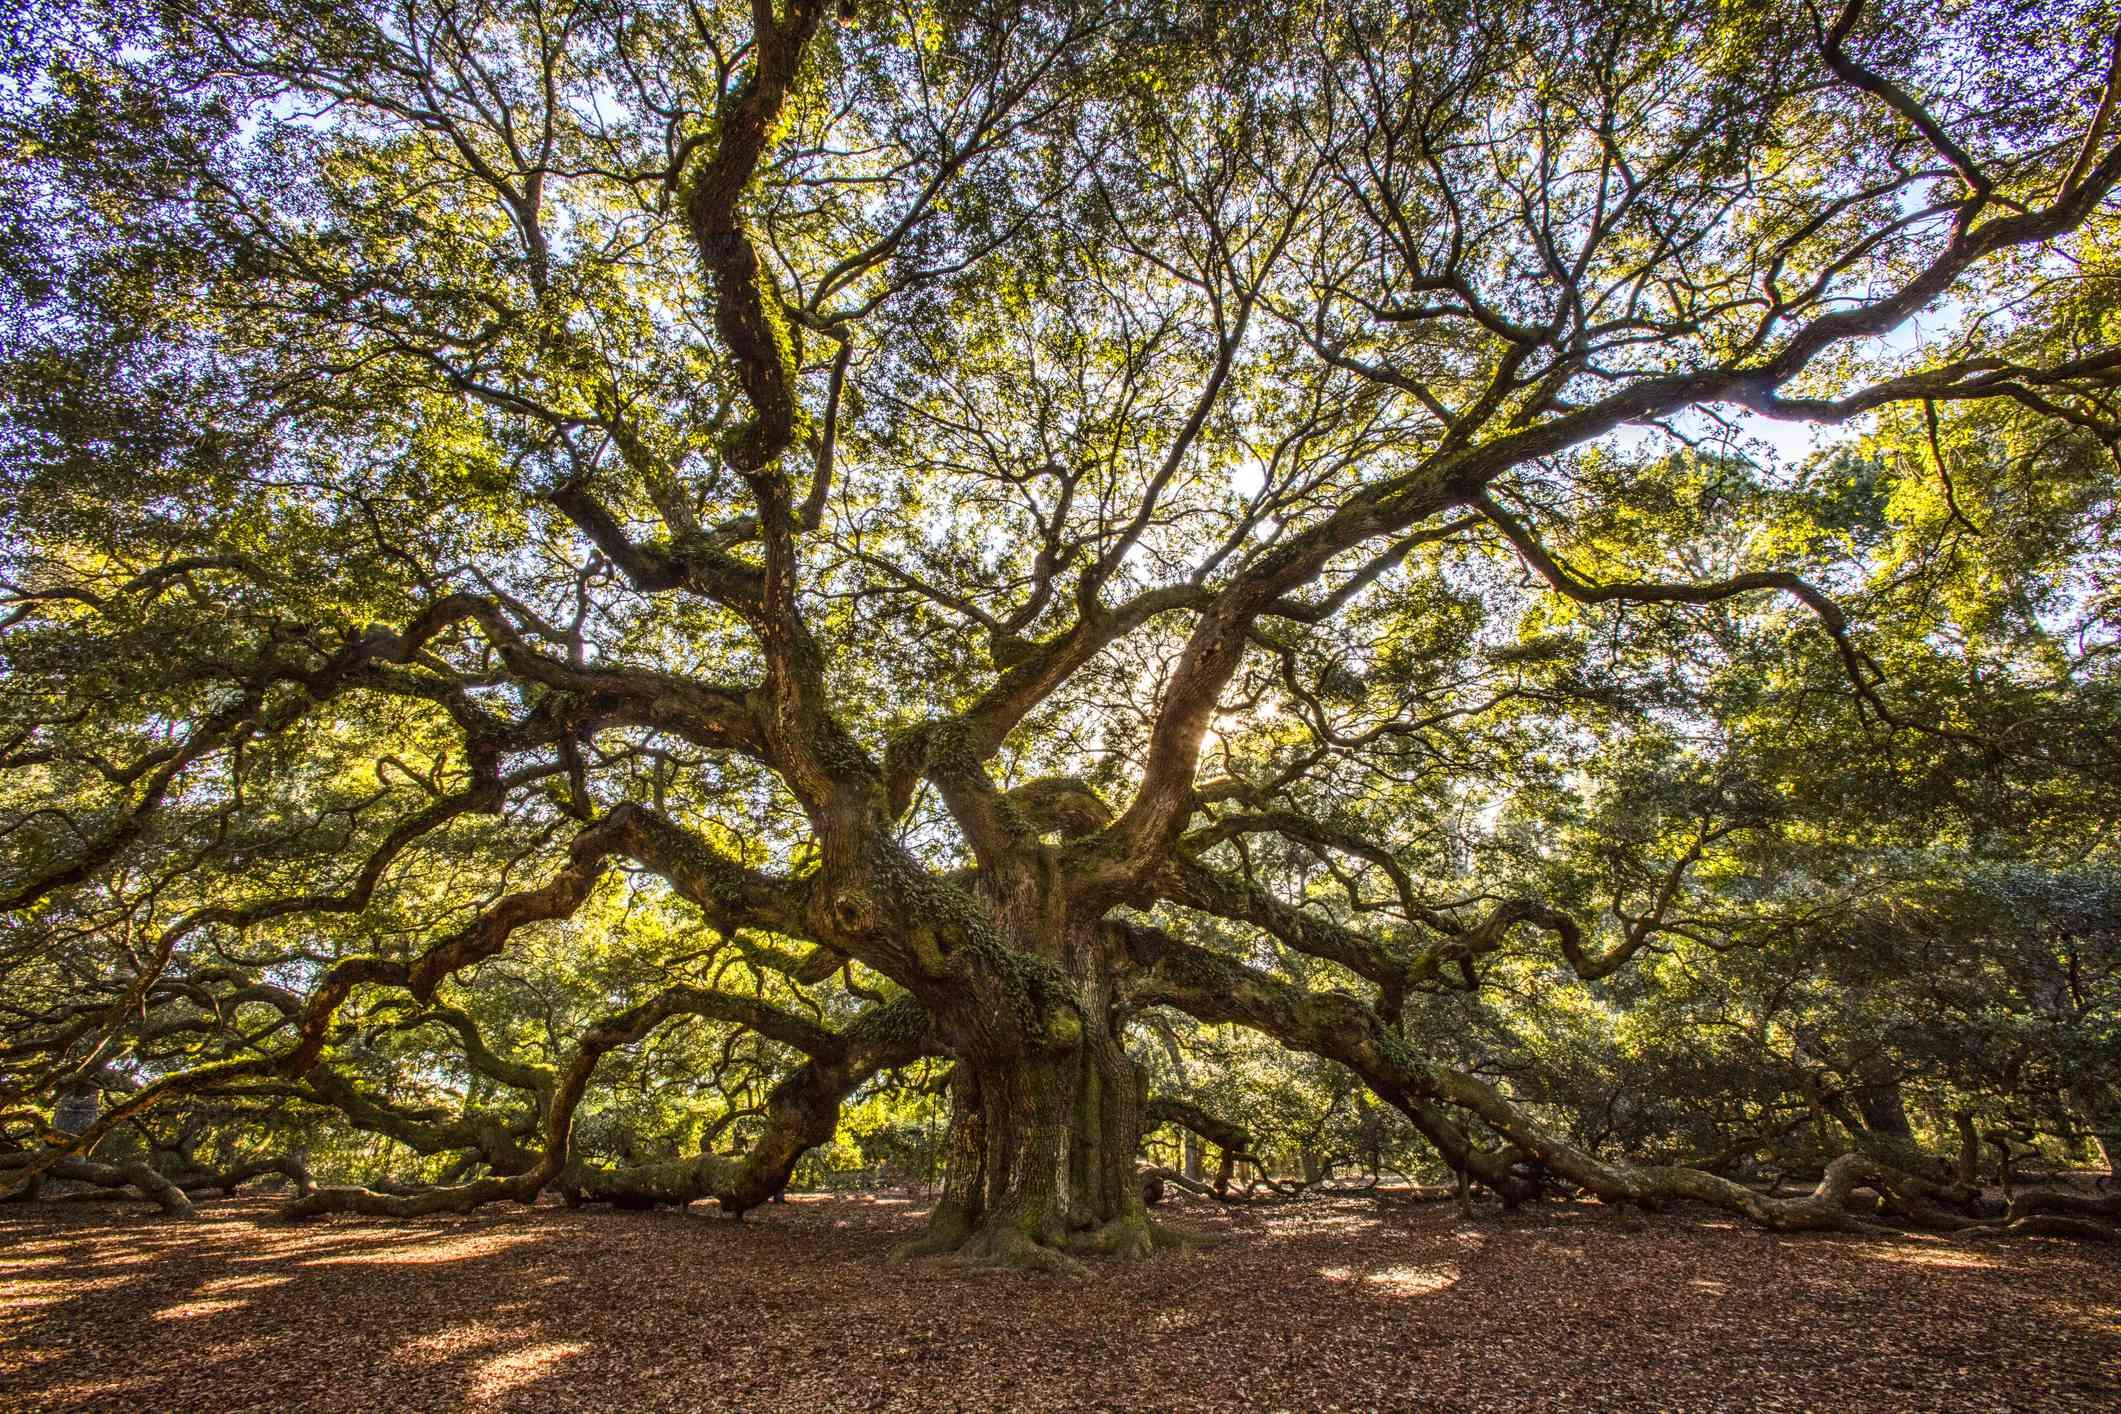 Large Angel Oak backed by sunlight on Johns Island near Charleston, South Carolina